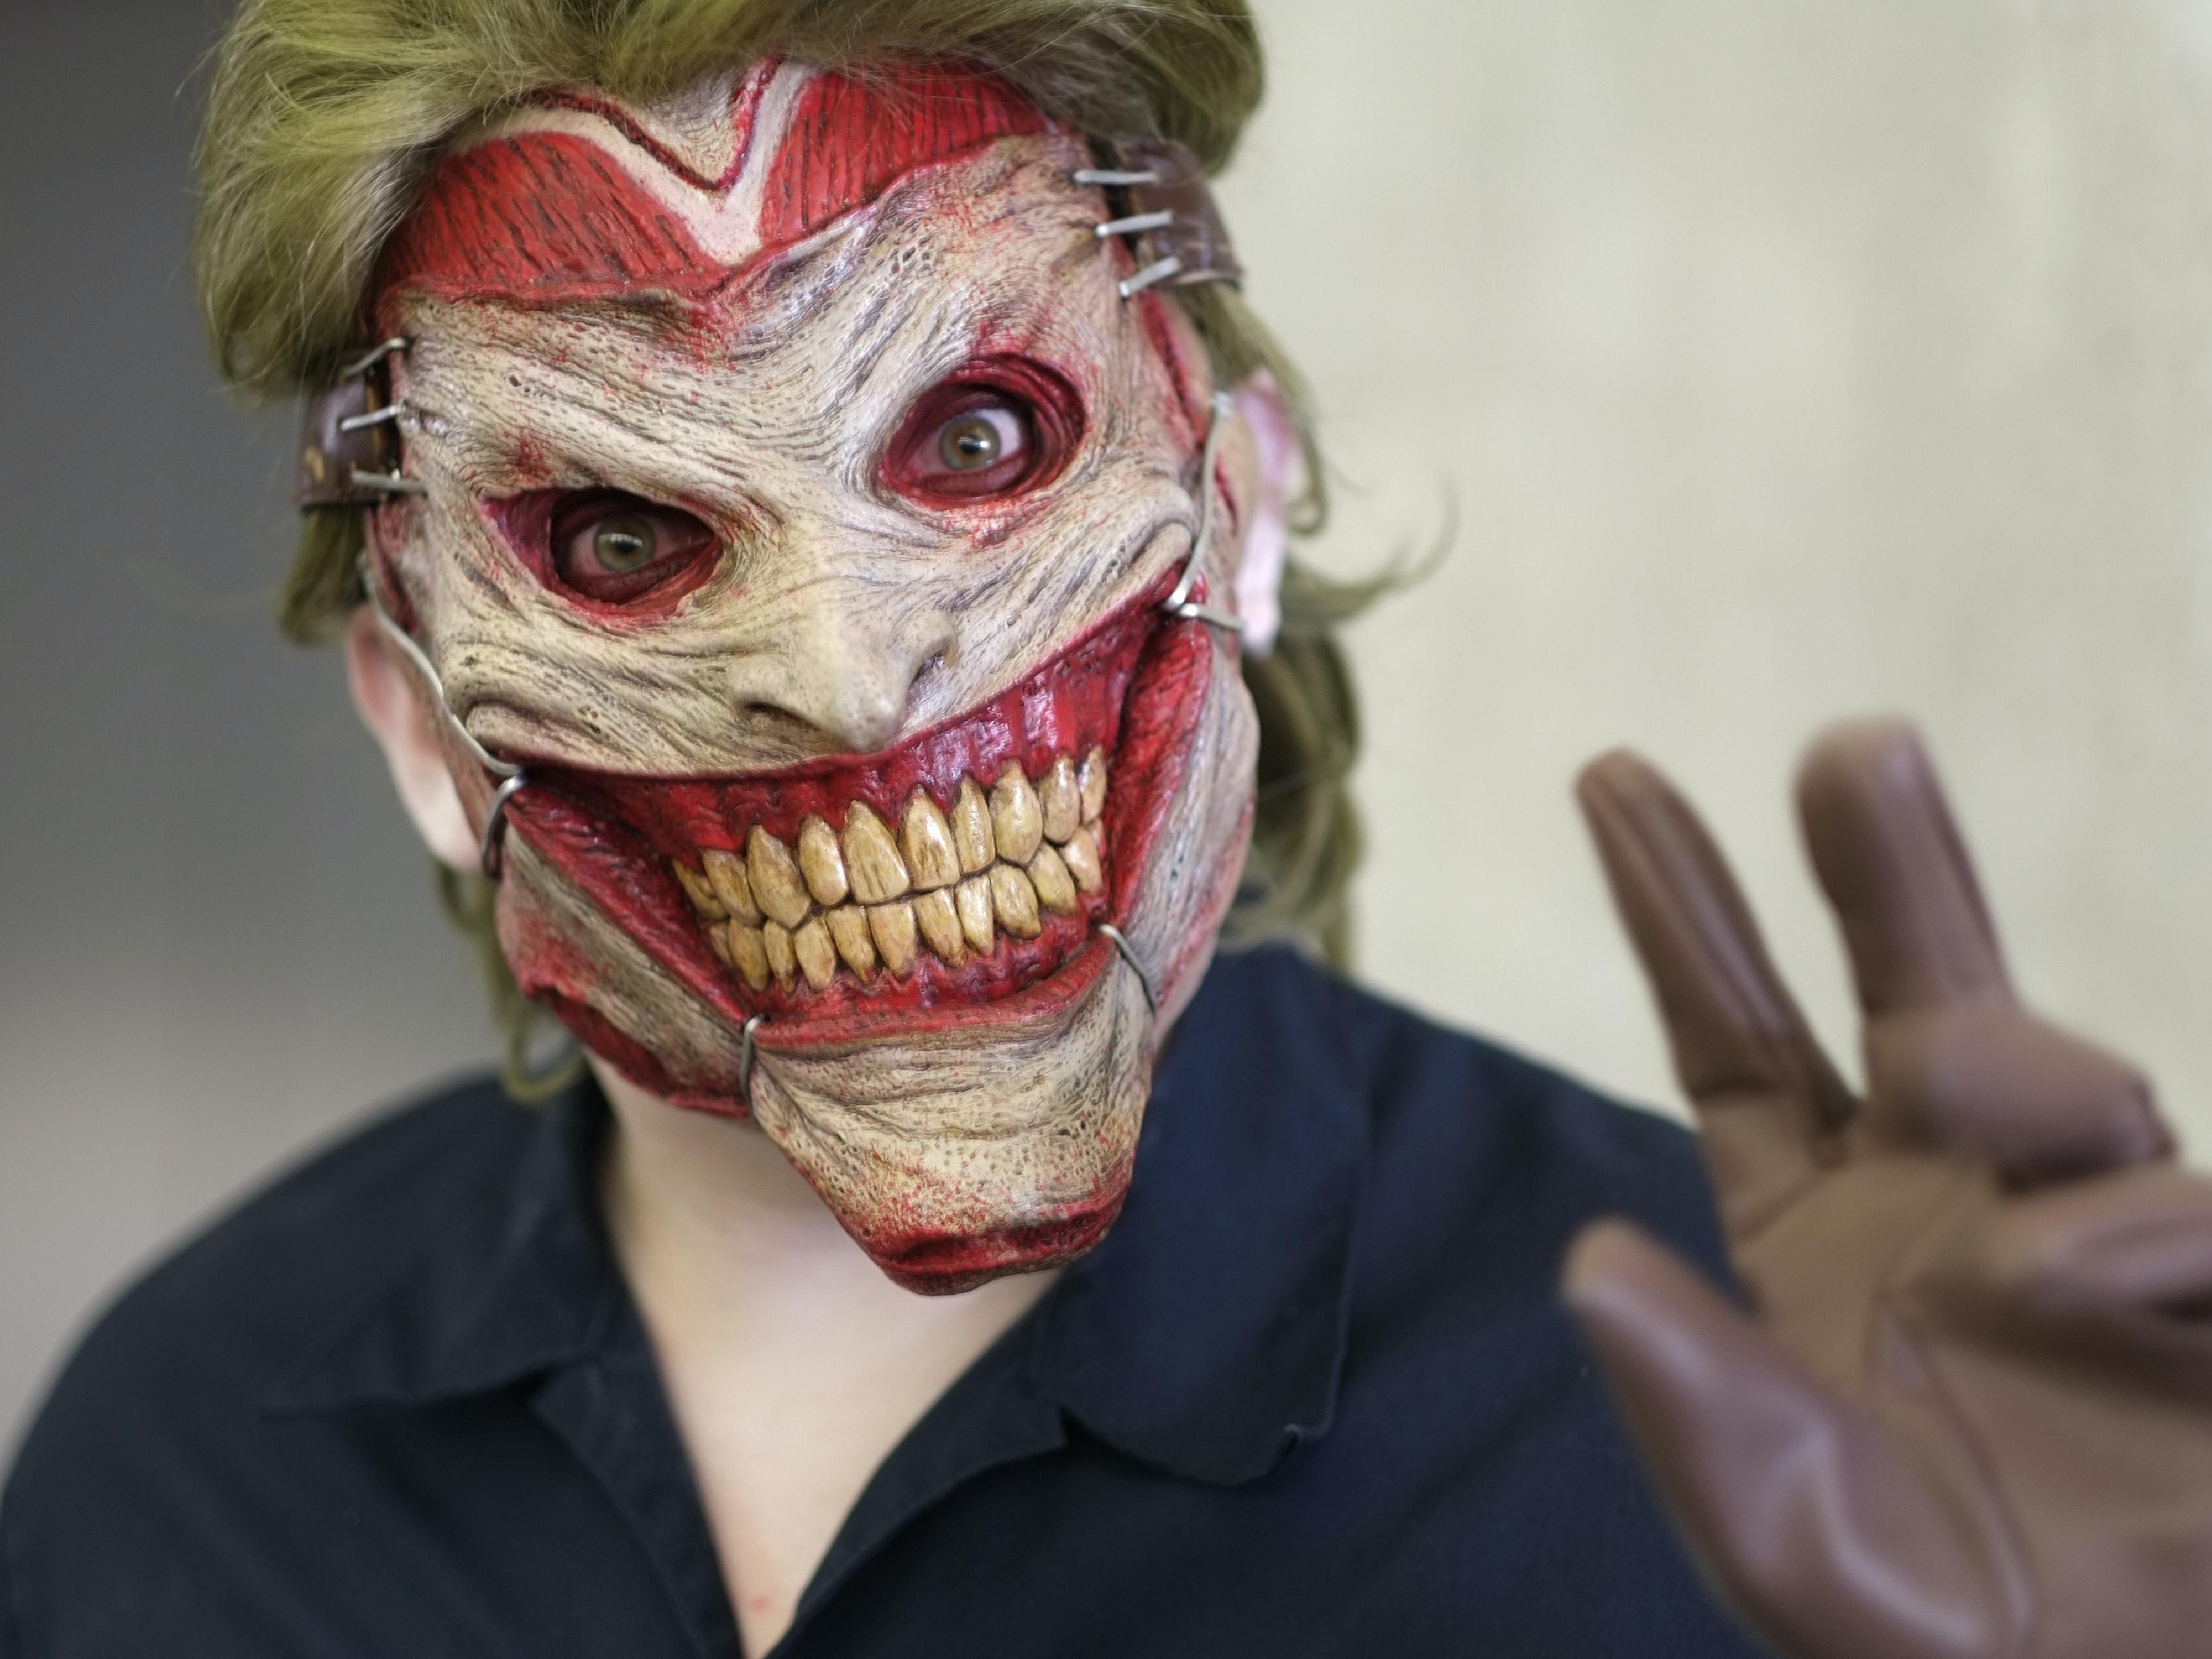 8 'Batman' Halloween Costume Ideas That Aren't Joker and Harley